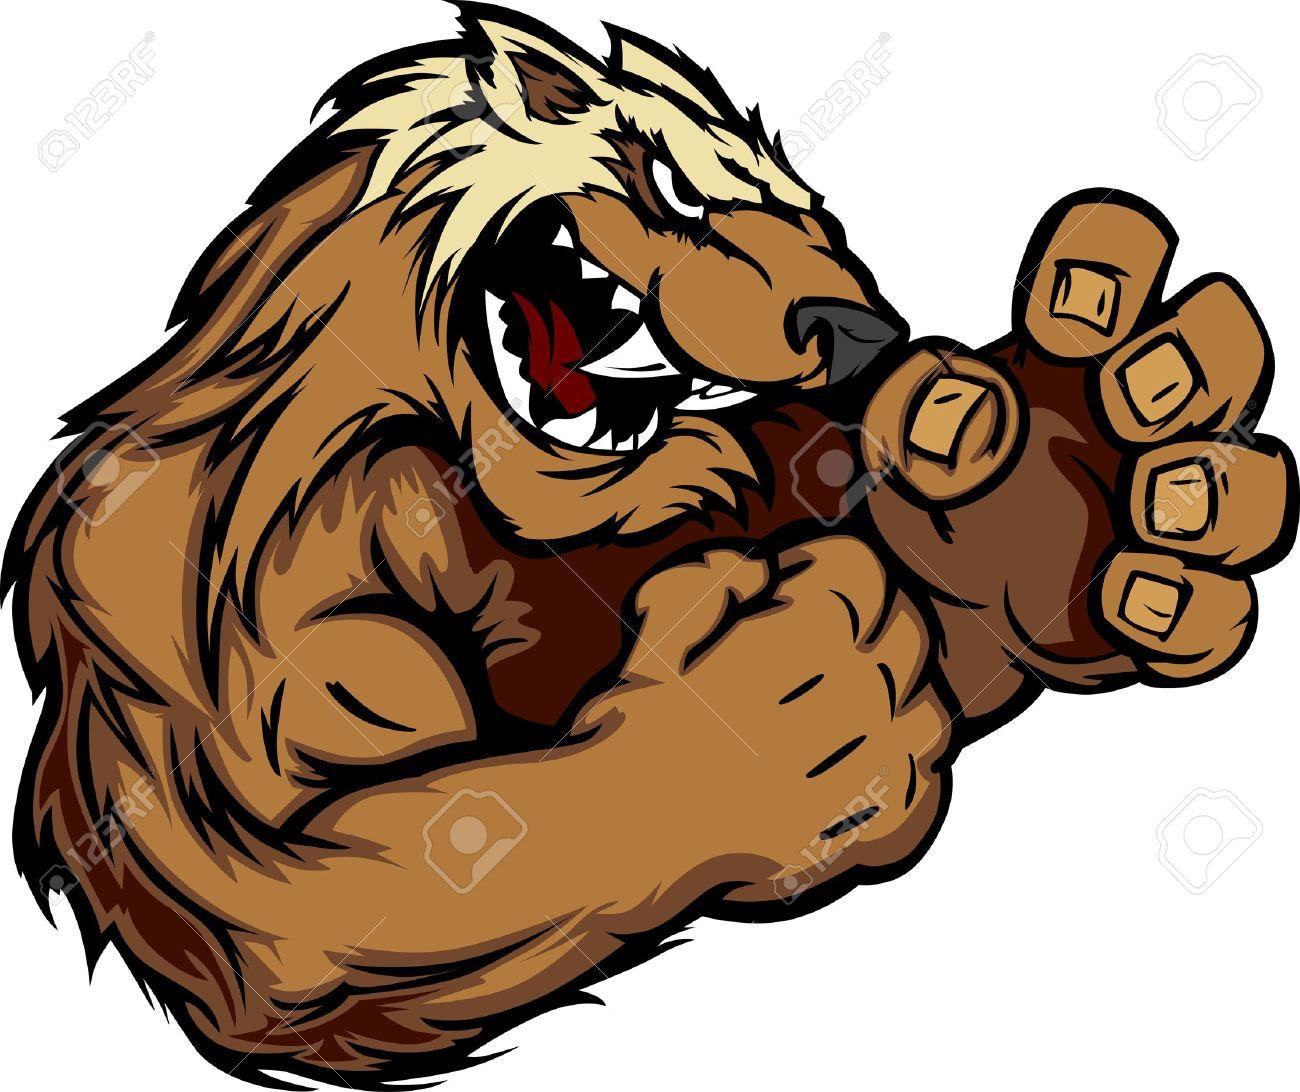 Wolverine Badger Fighting Mascot Body Vector Illustration.